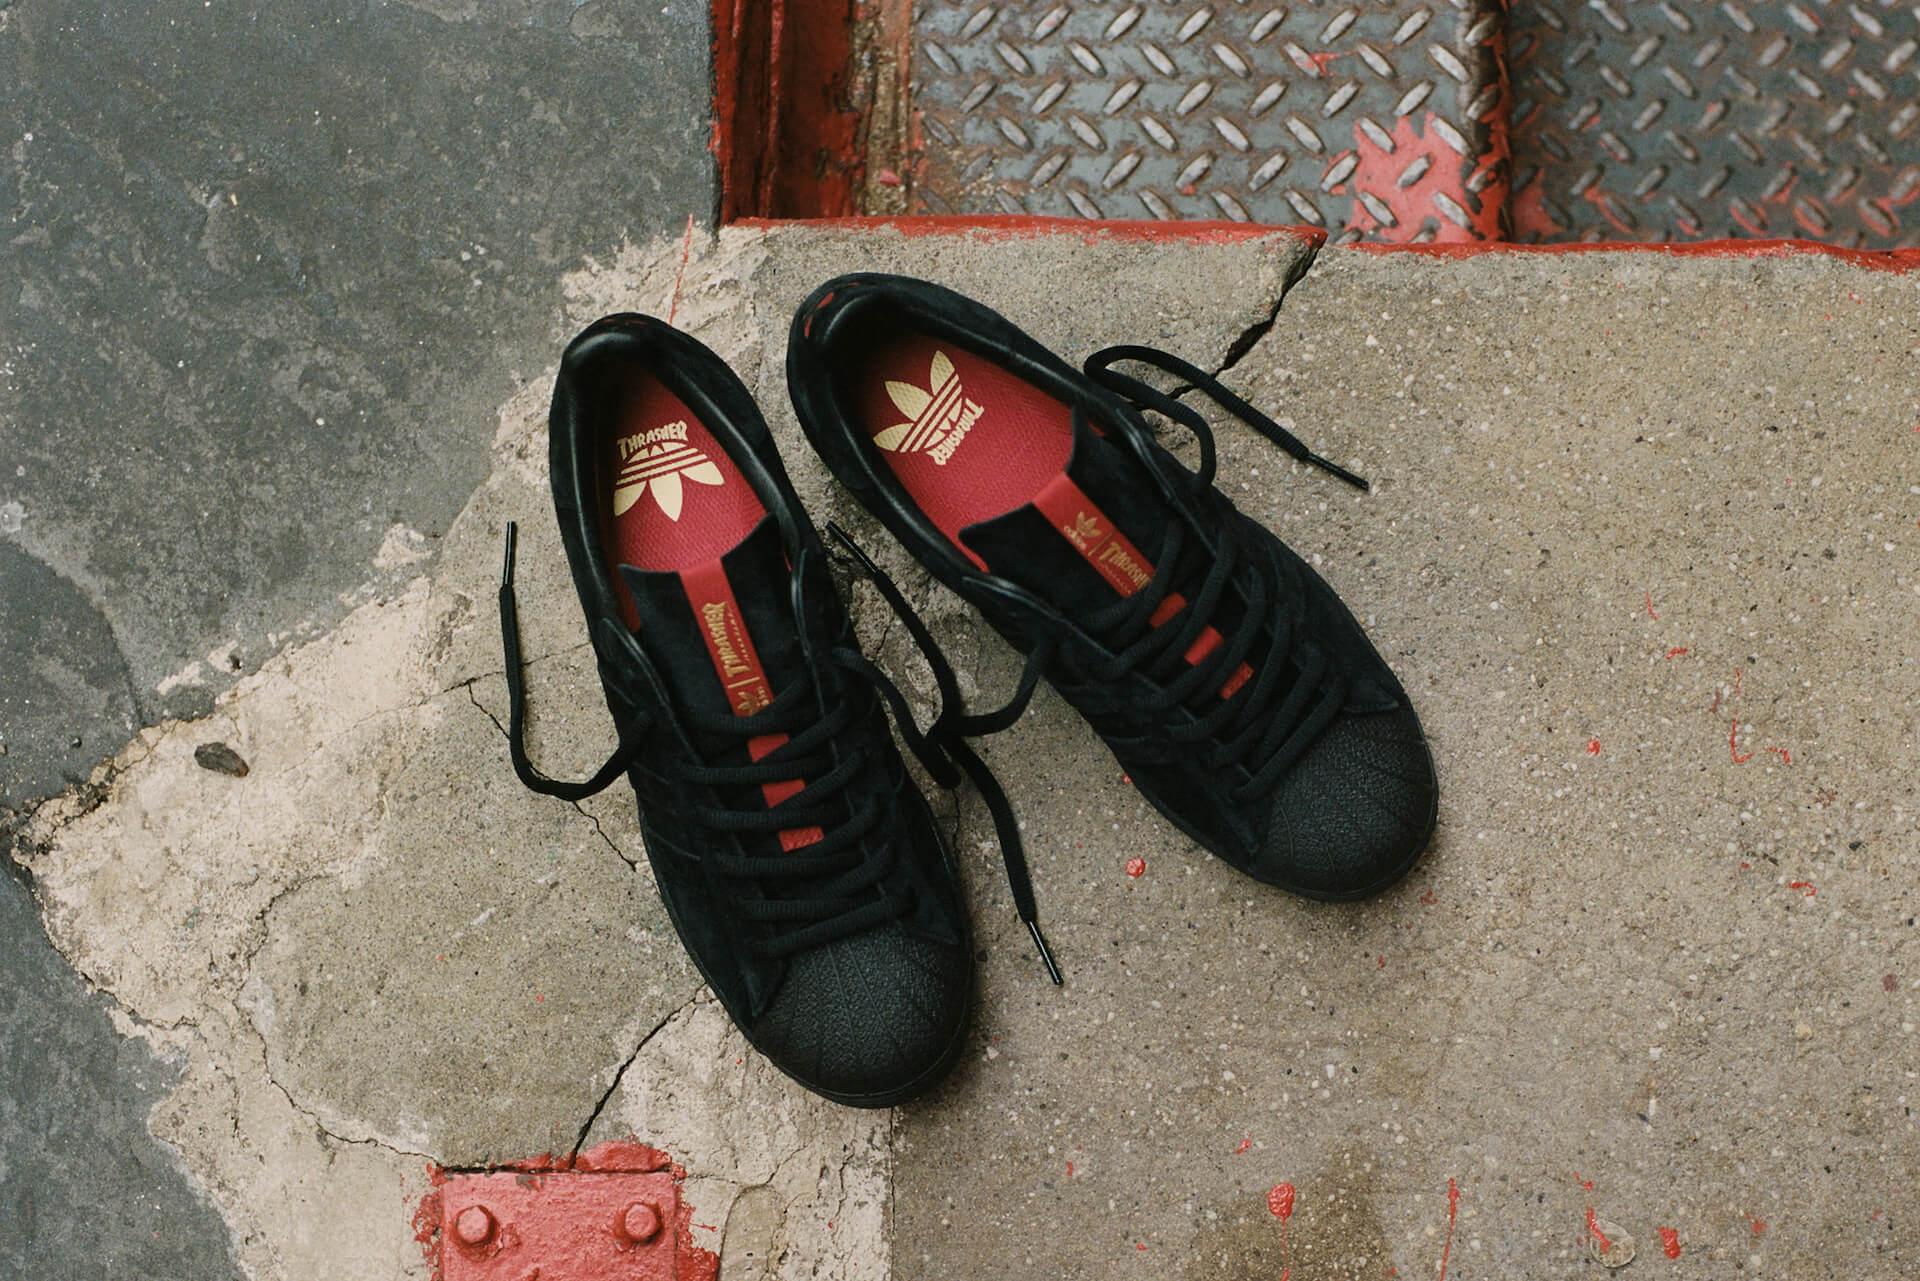 adidas SkateboardingとTHRASHERがコラボ!プロスケーターTyshawn Jonesのシグネチャーモデル&新型SUPERSTARが登場 life201126_adidas_skateboarding_17